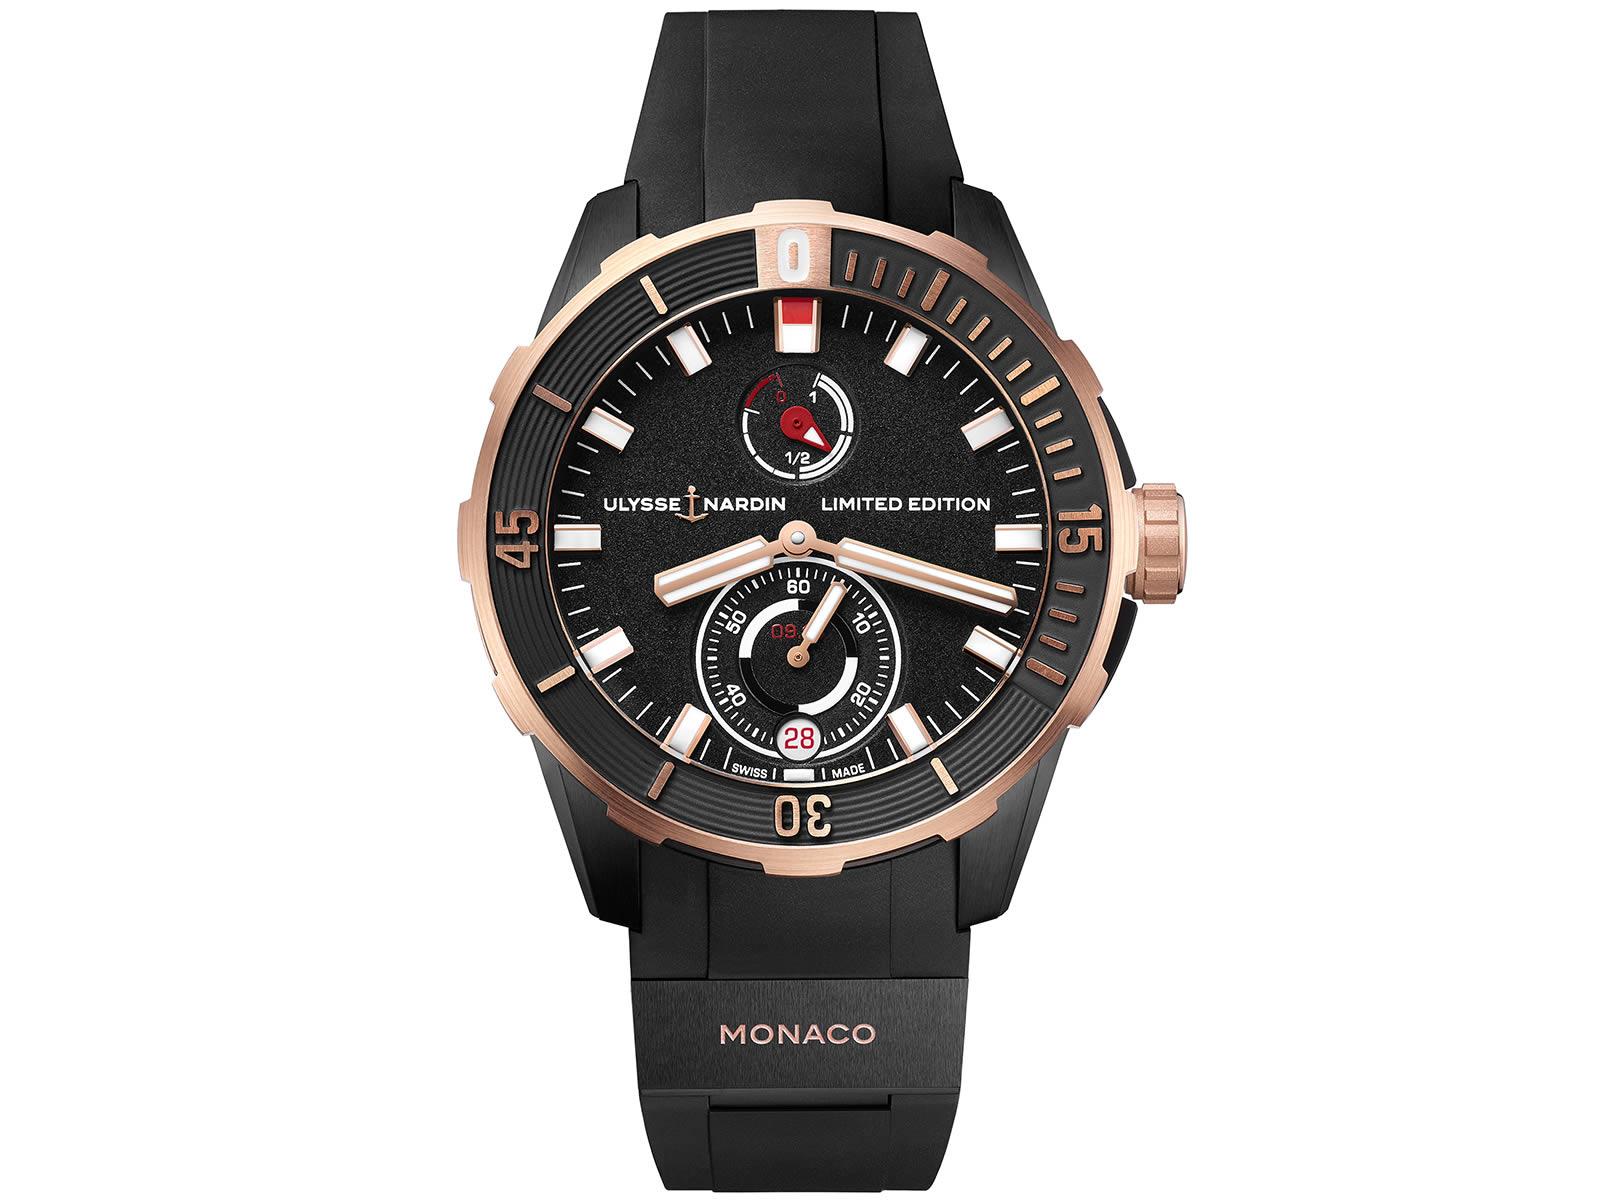 1185-170le-3-black-mon-ulysse-nardin-diver-chronometer-monaco-limited-edition.jpg